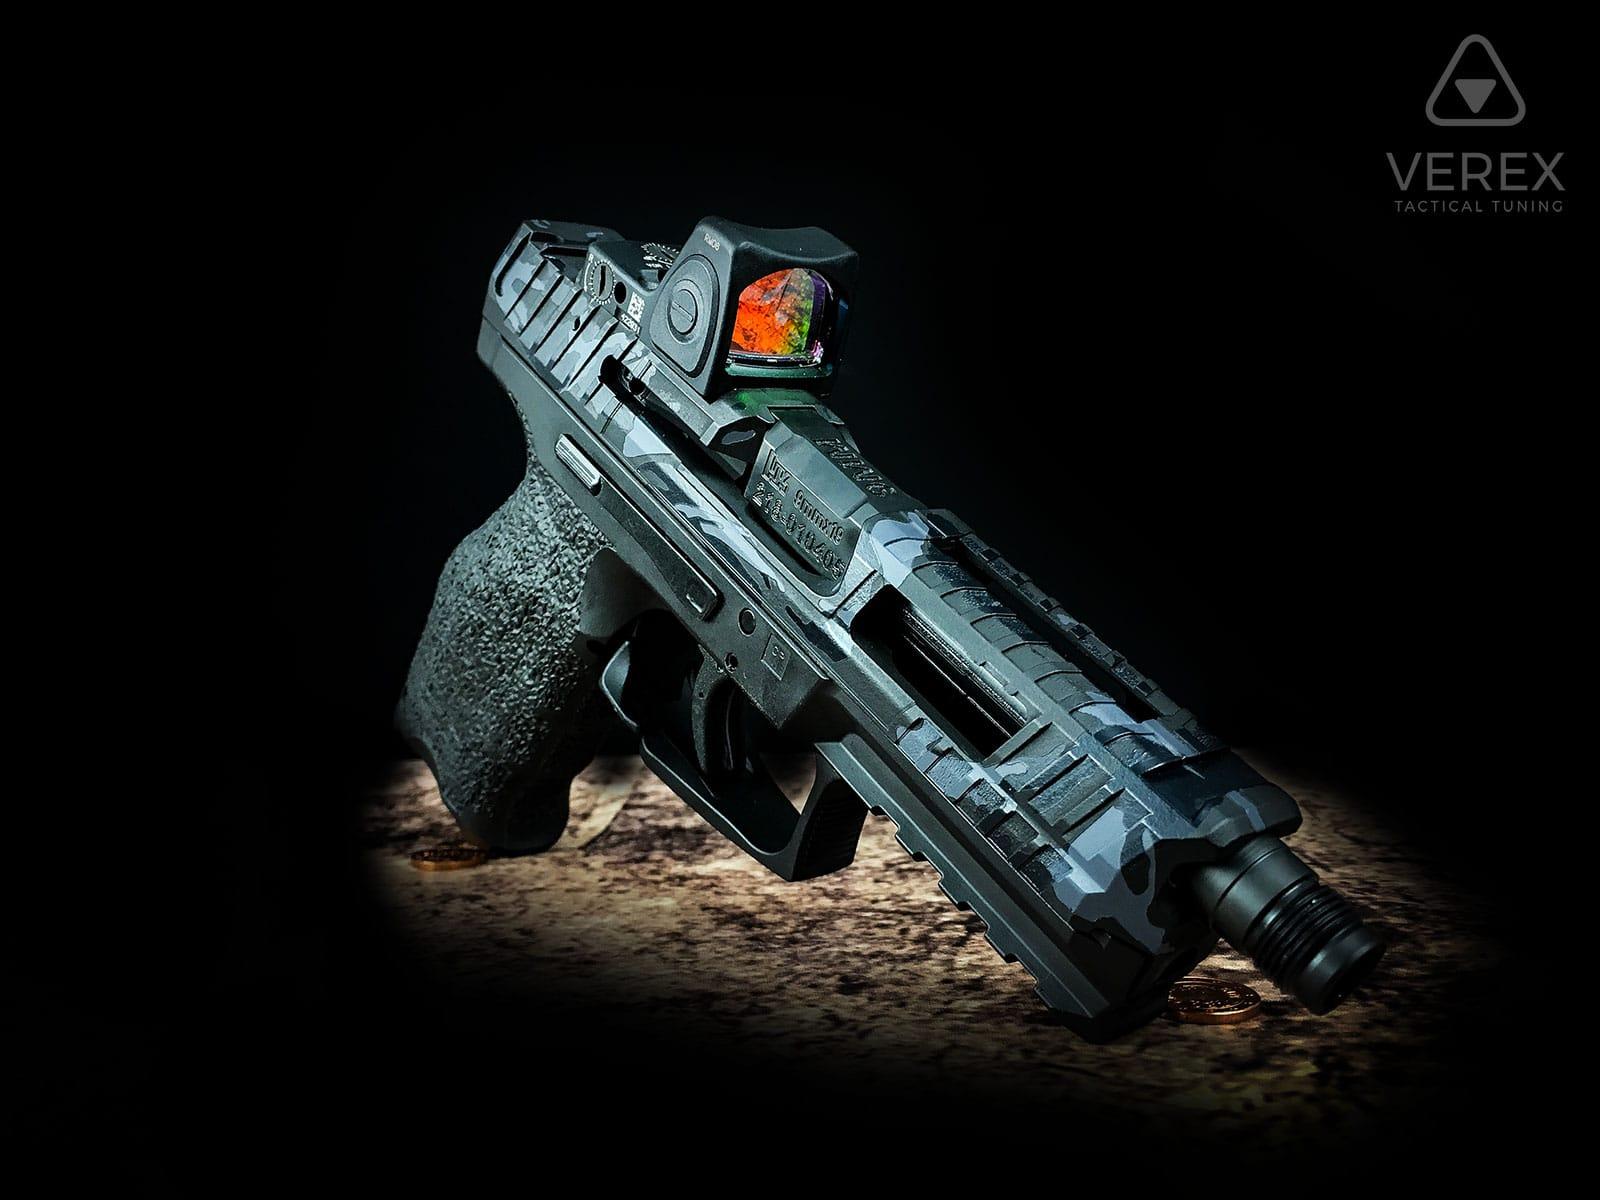 hk-heckler-&-koch-waffentuning-fensterausschnitte-slide-cuts-trijicon-rmr-serrations-laser-cerakote-verextactical